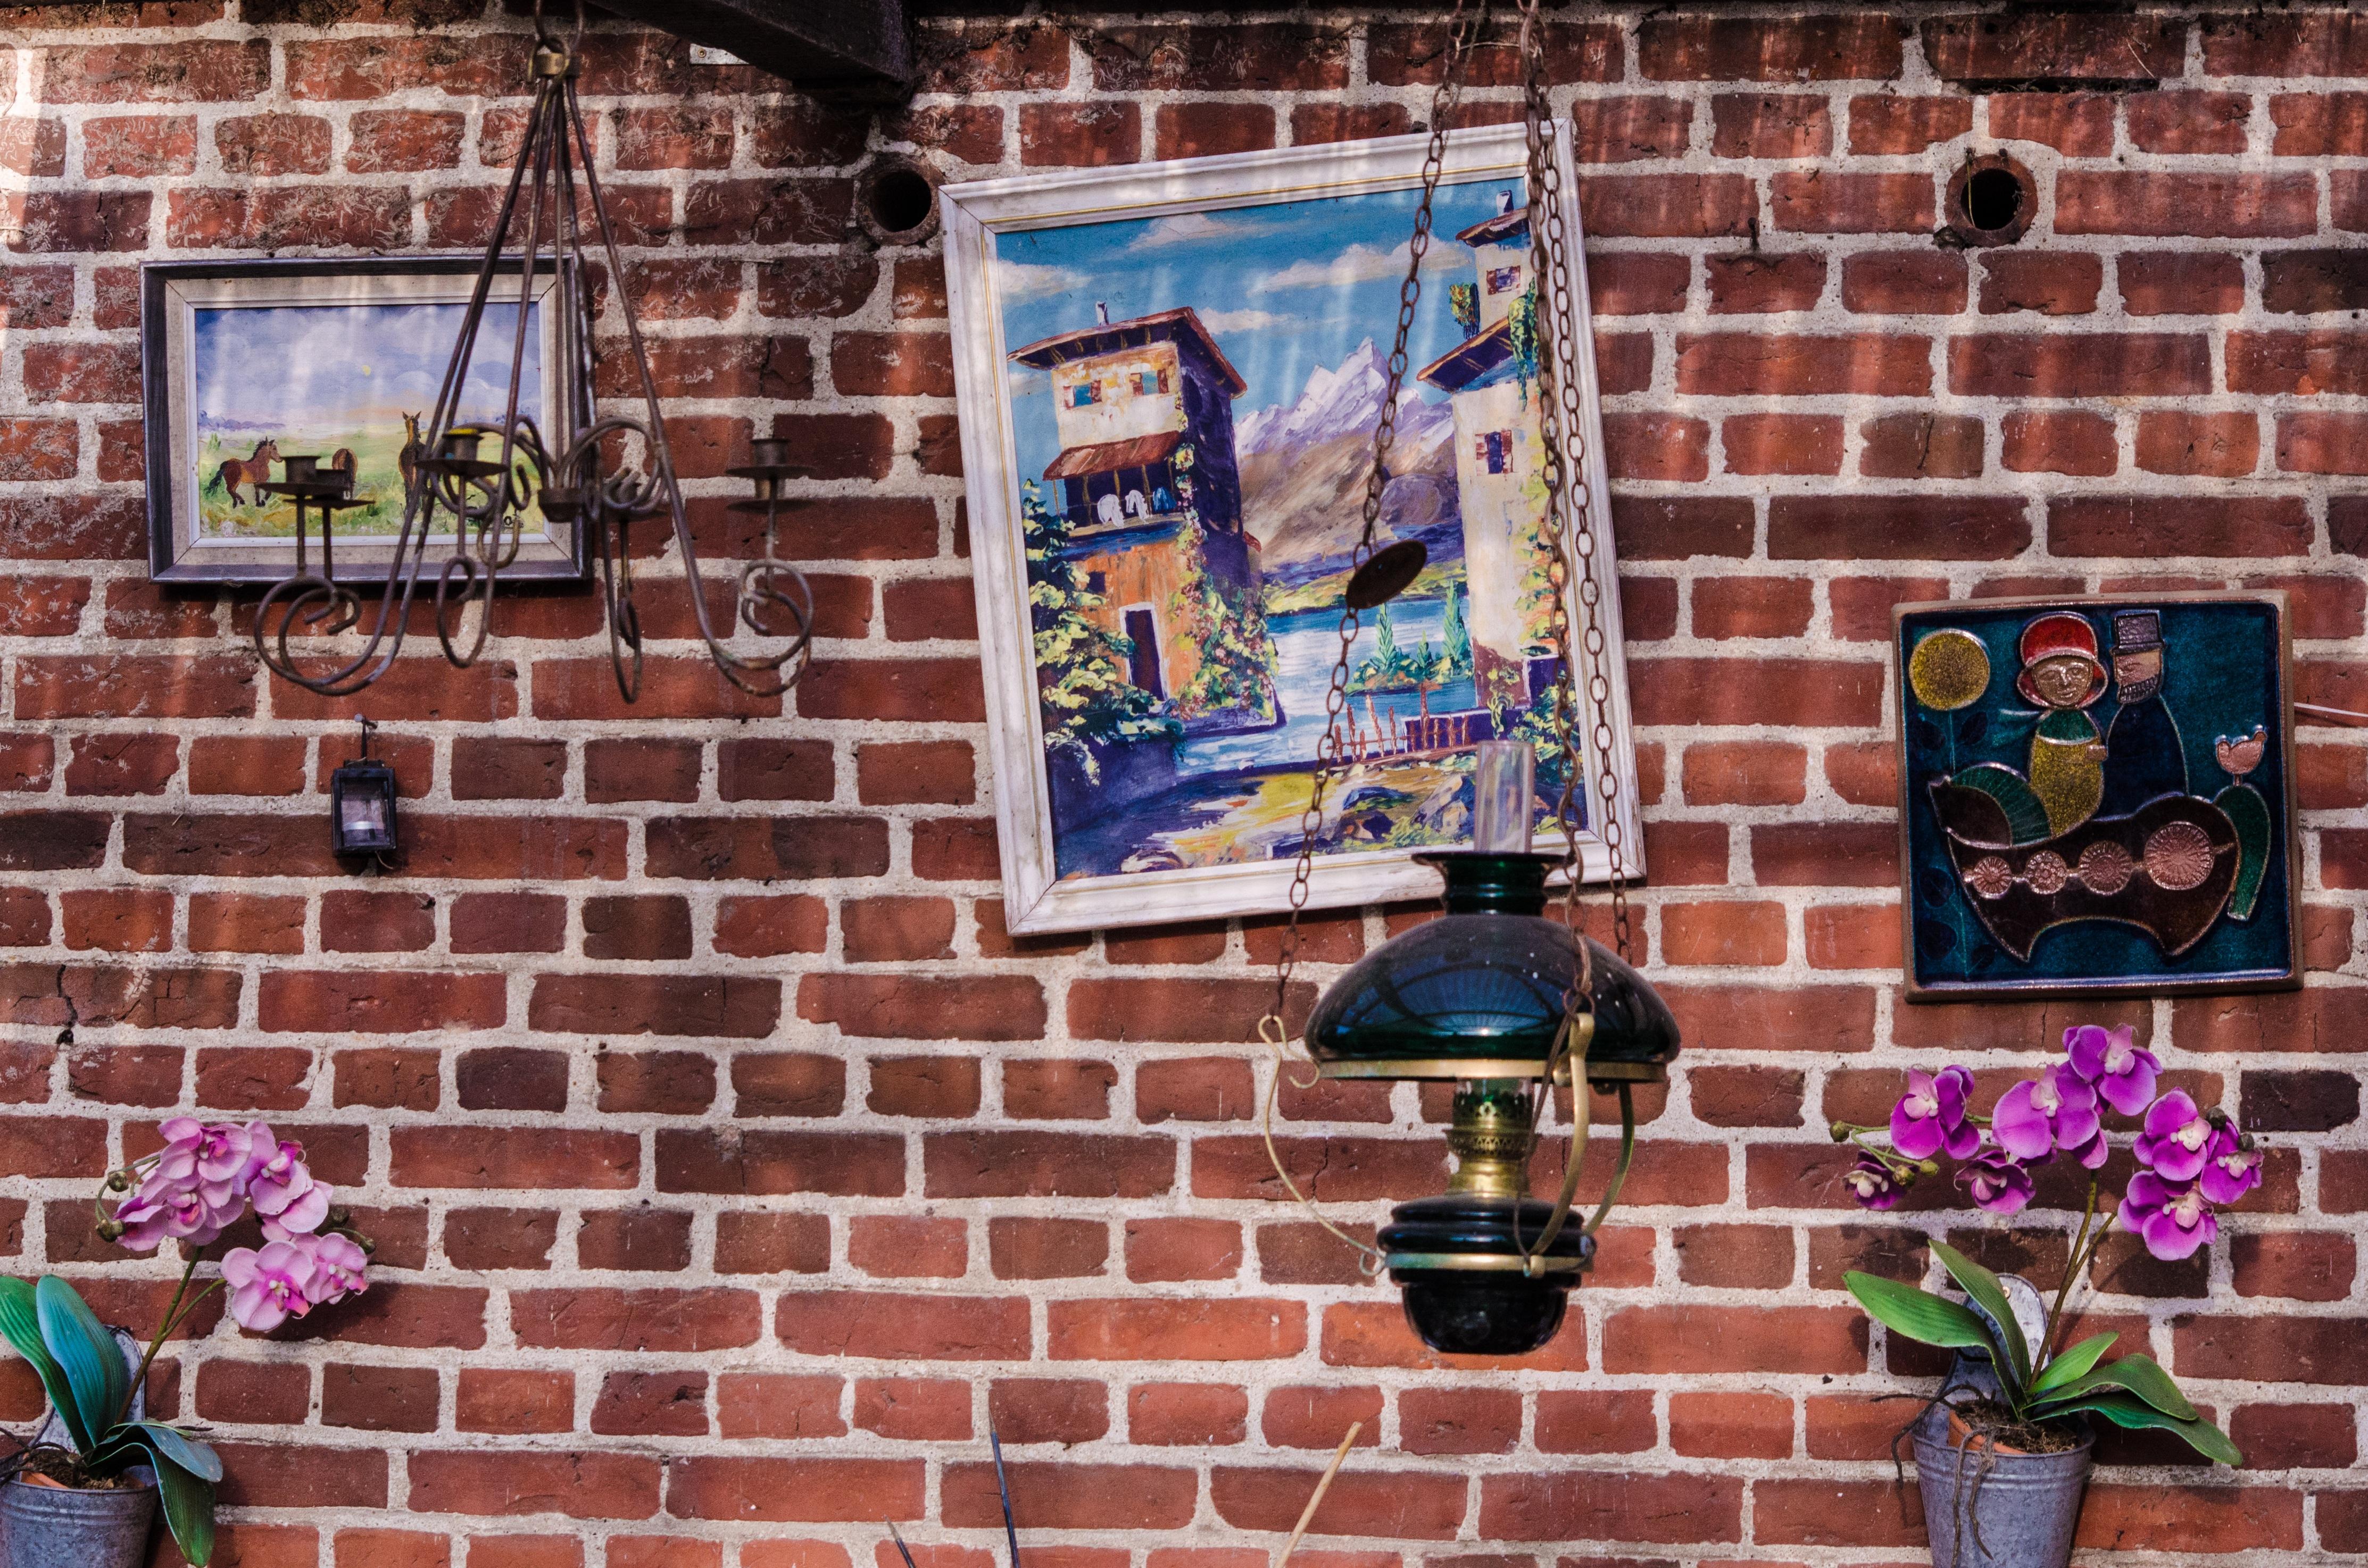 Grafiti wall red - Grungy Street Vintage Flower Window Home Wall Red Color Brick Graffiti Painting Street Art Living Art